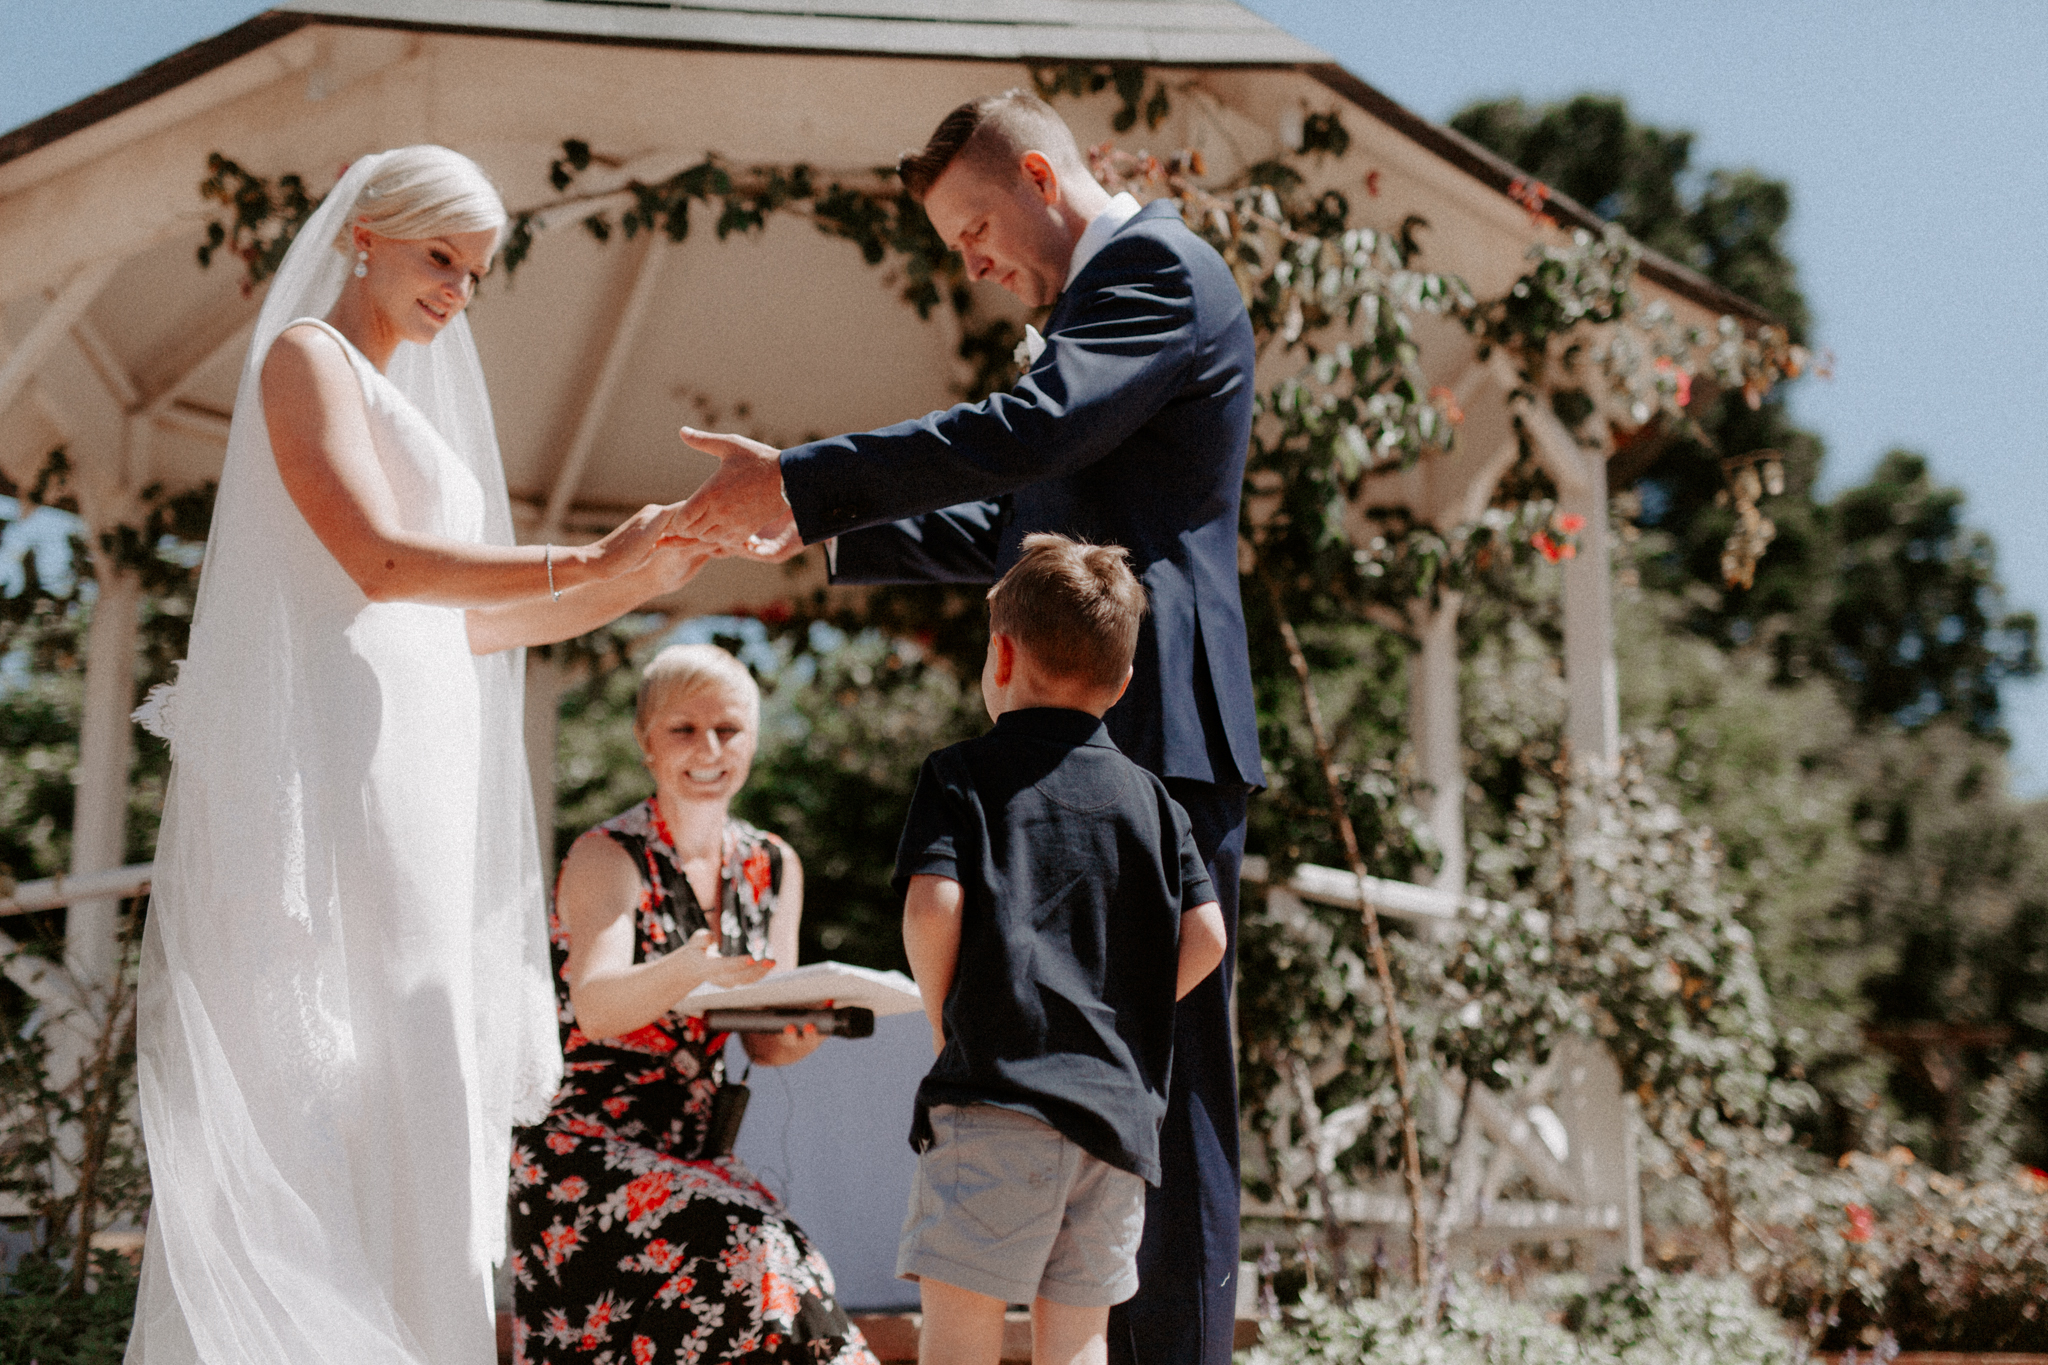 St-Kilda-Garden-Wedding-Emotions-and-Math-Photograph-057.jpg